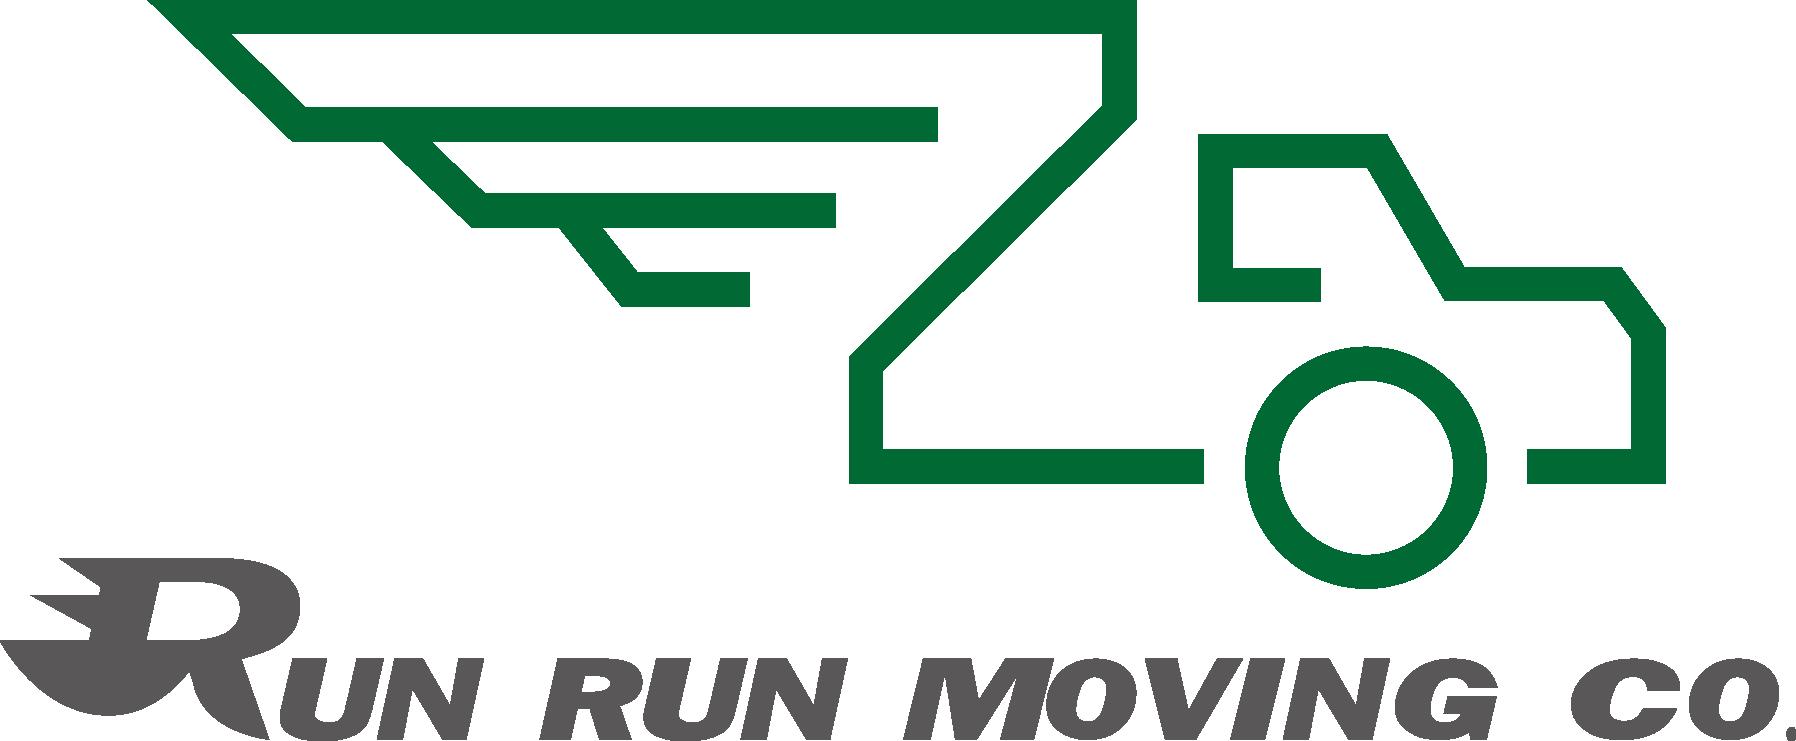 Run Run Moving Company Logo